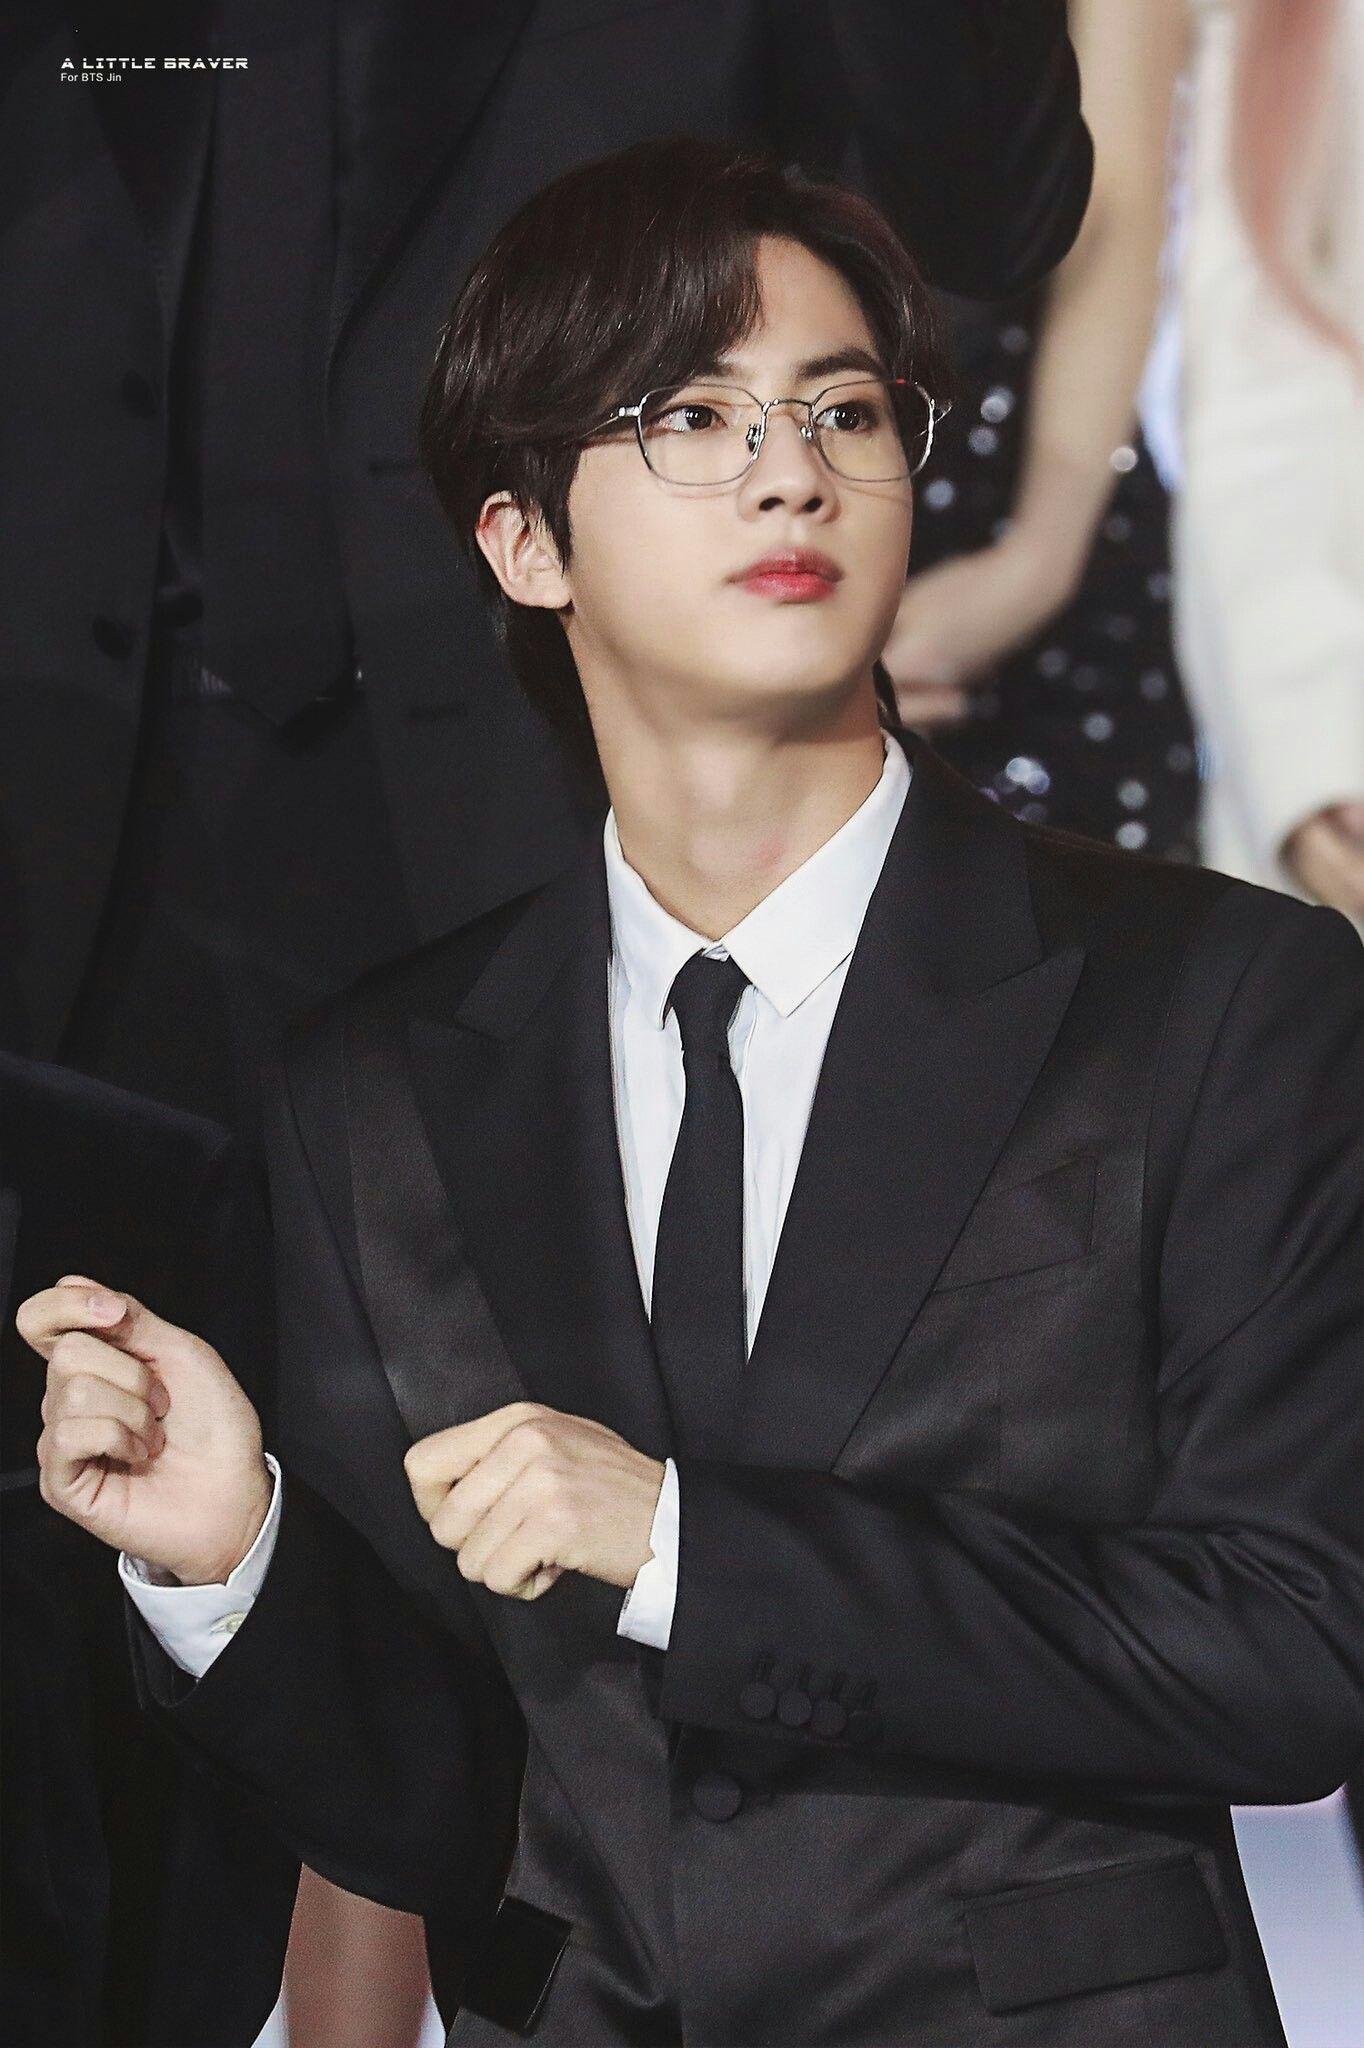 Kim Seokjin In 2020 Seokjin Seokjin Bts Worldwide Handsome